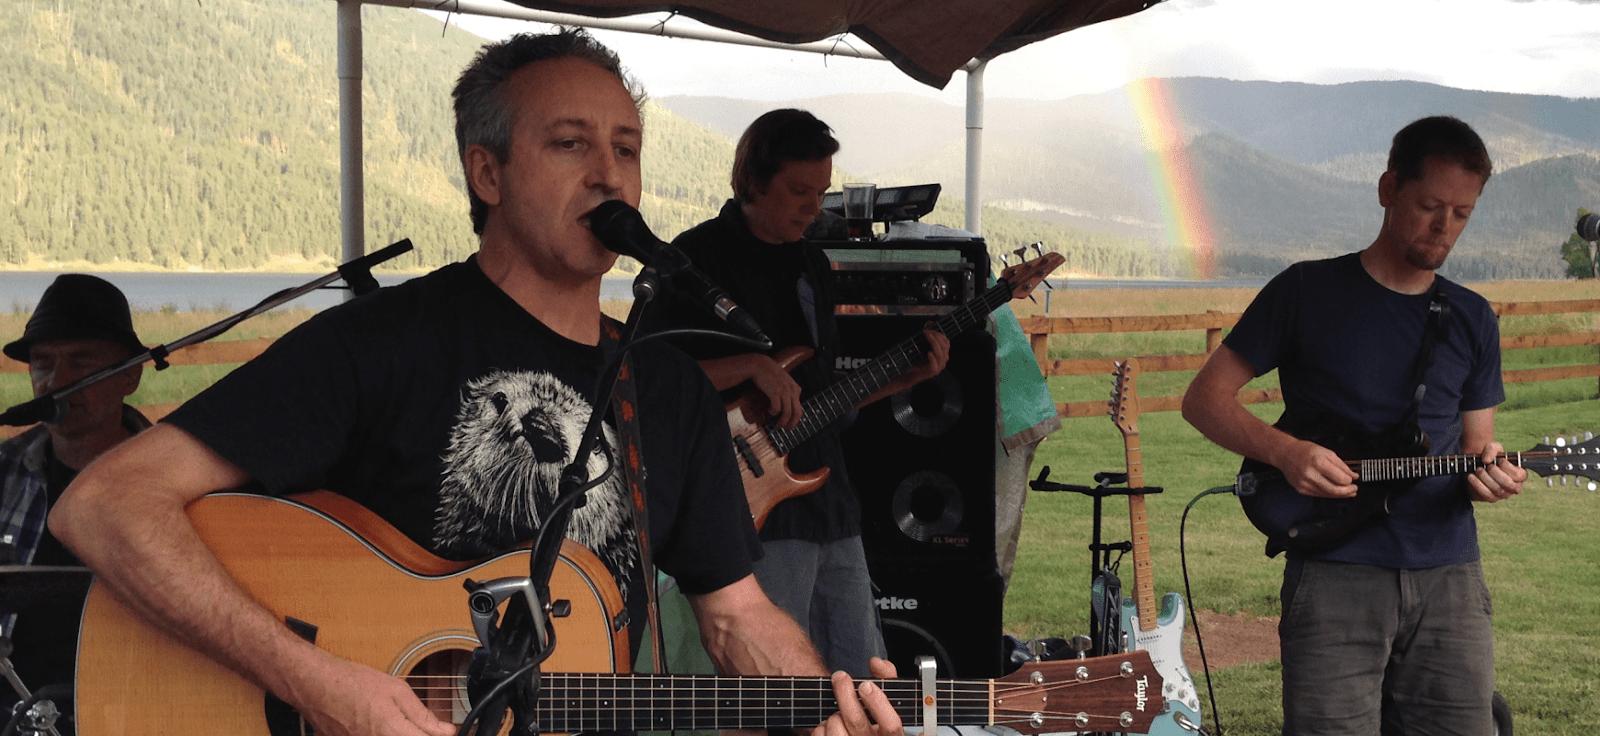 Pete Gullianni: Live Performance at Dalton Ranch Golf Club